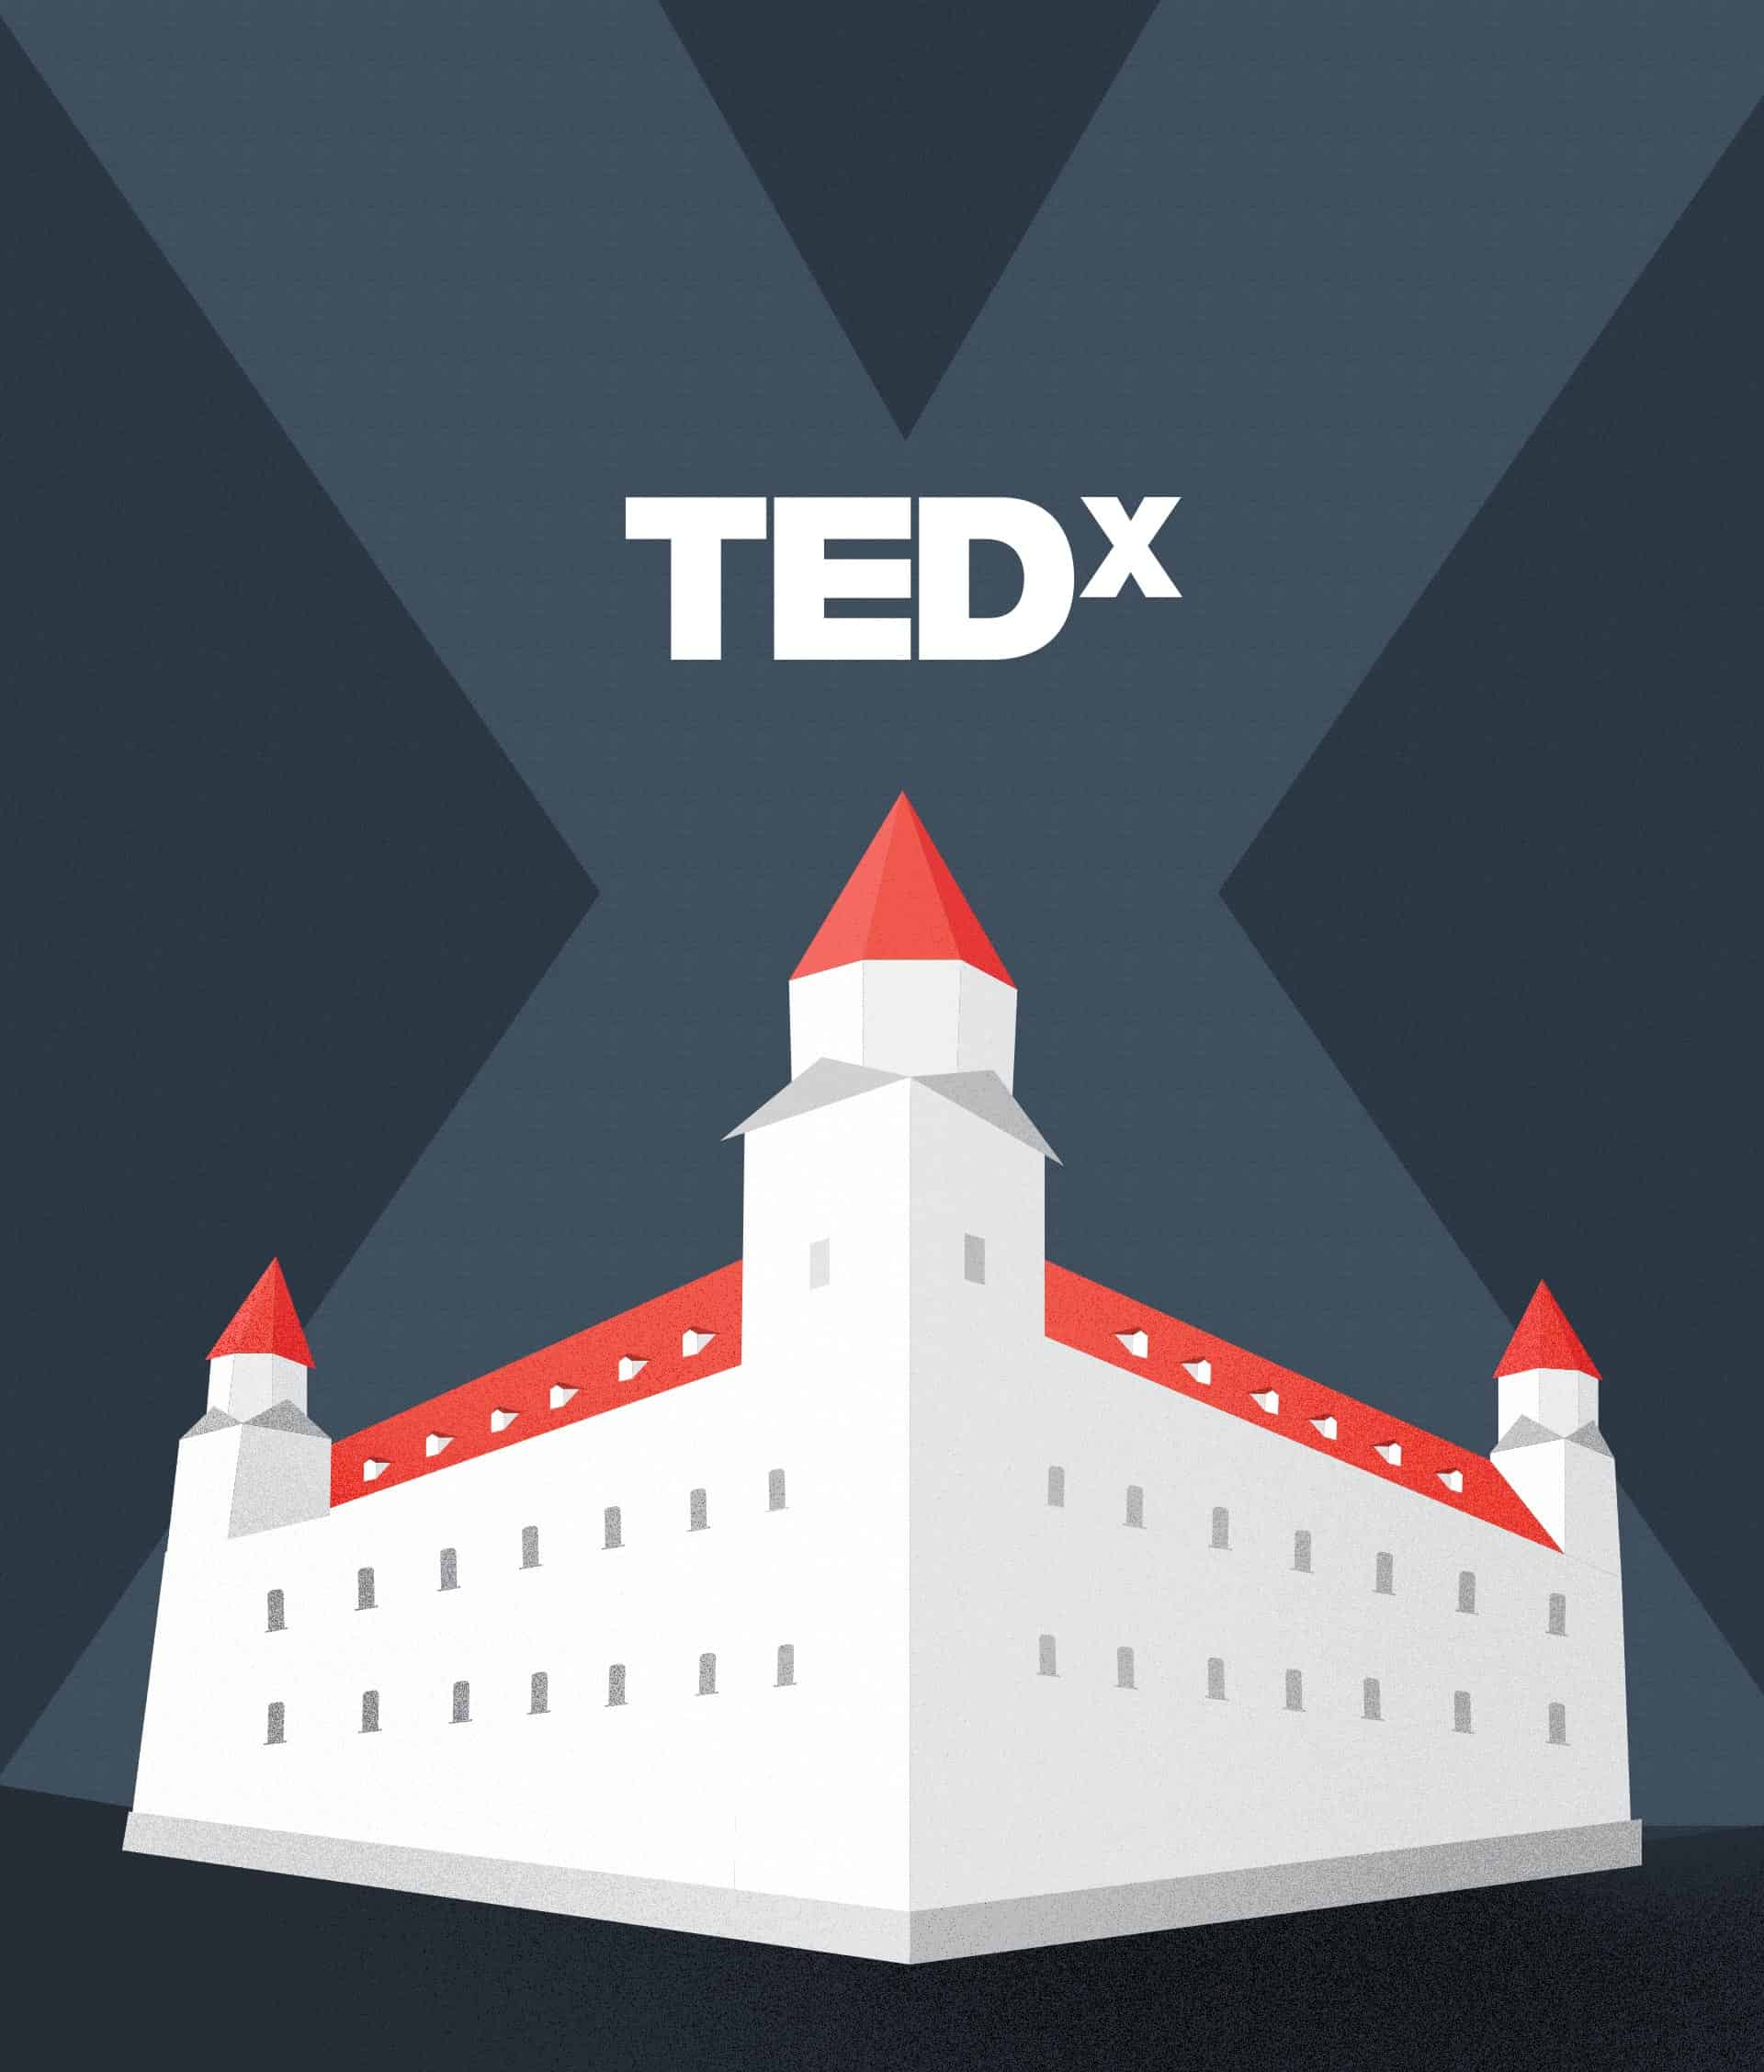 WebSupport podporuje TEDx